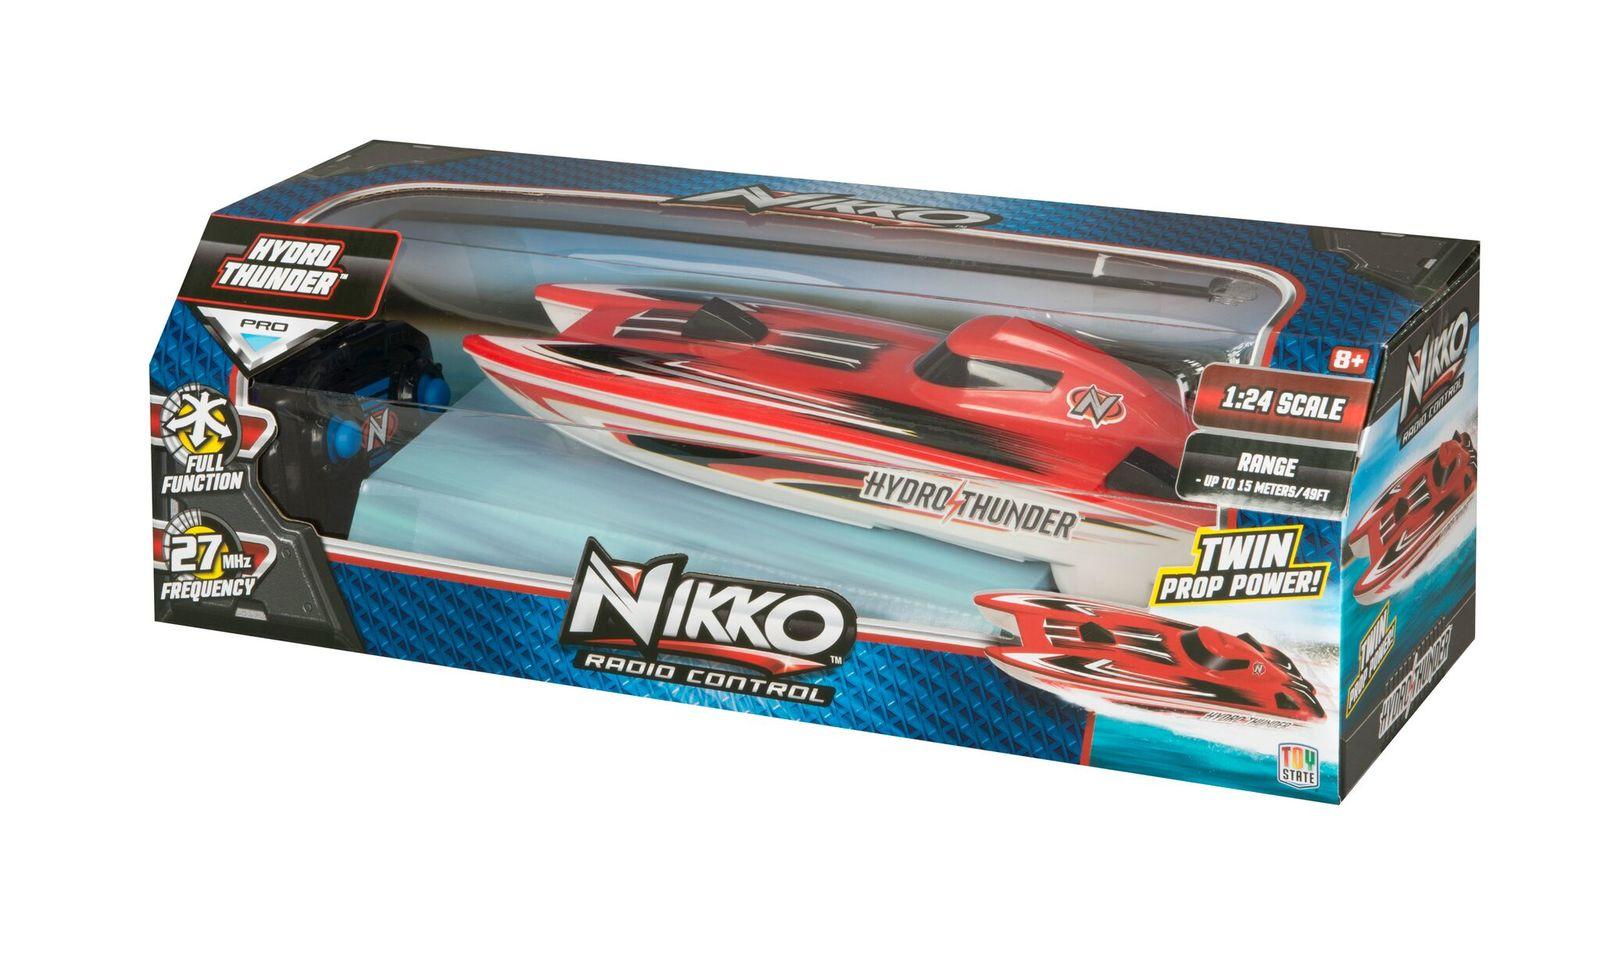 Nikko R/C Hydro Thunder Boat image